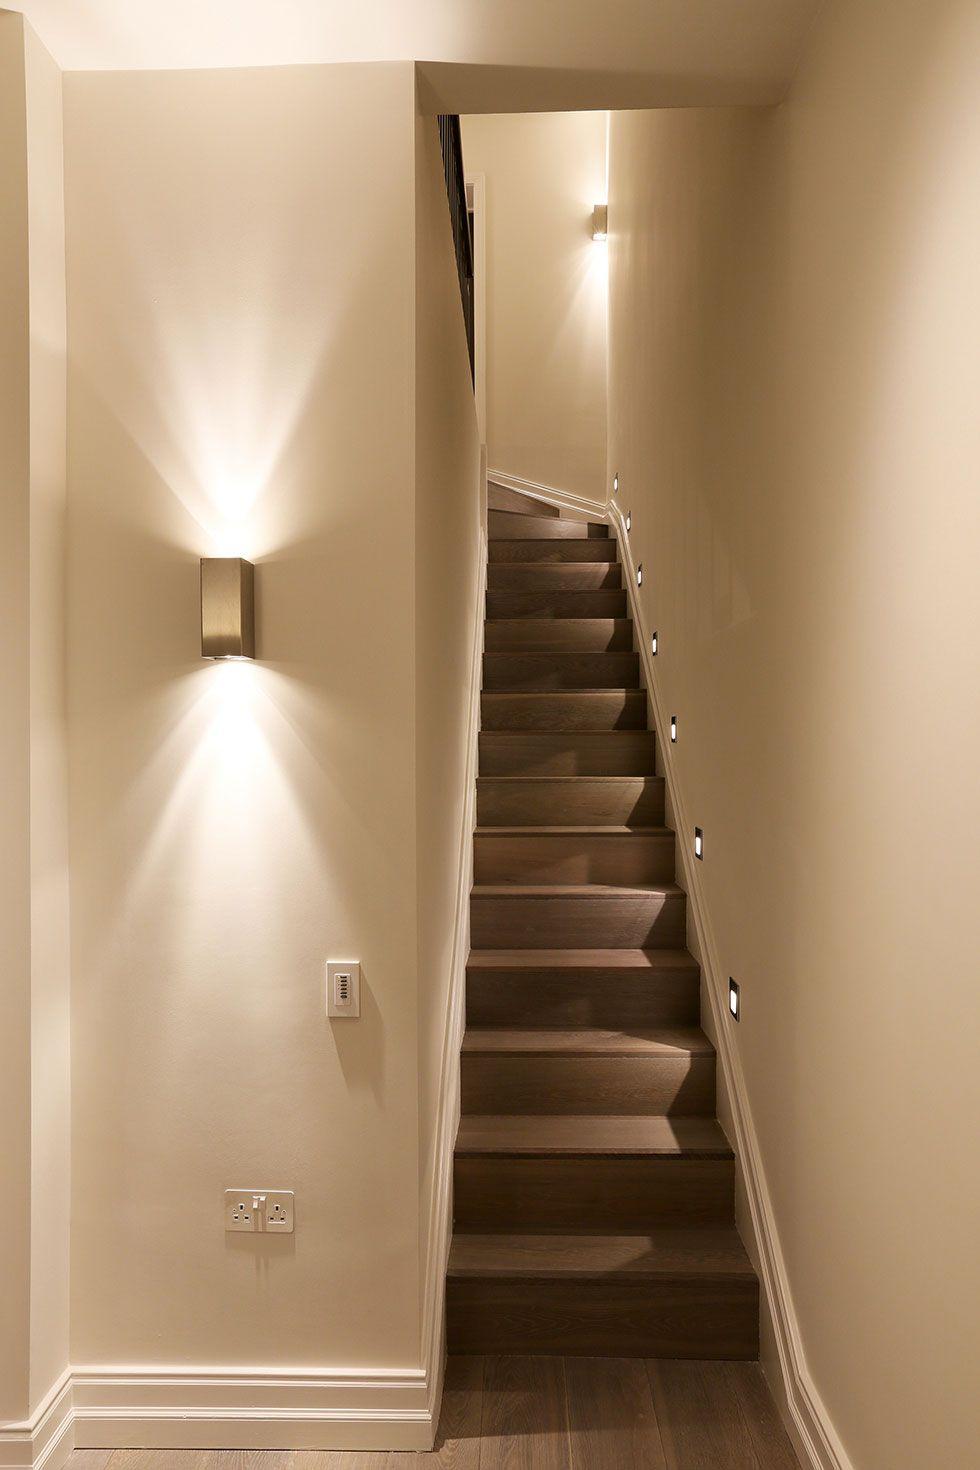 4 John Cullen Lighting stairs. 4 John Cullen Lighting stairs   Lighting   Pinterest   Design